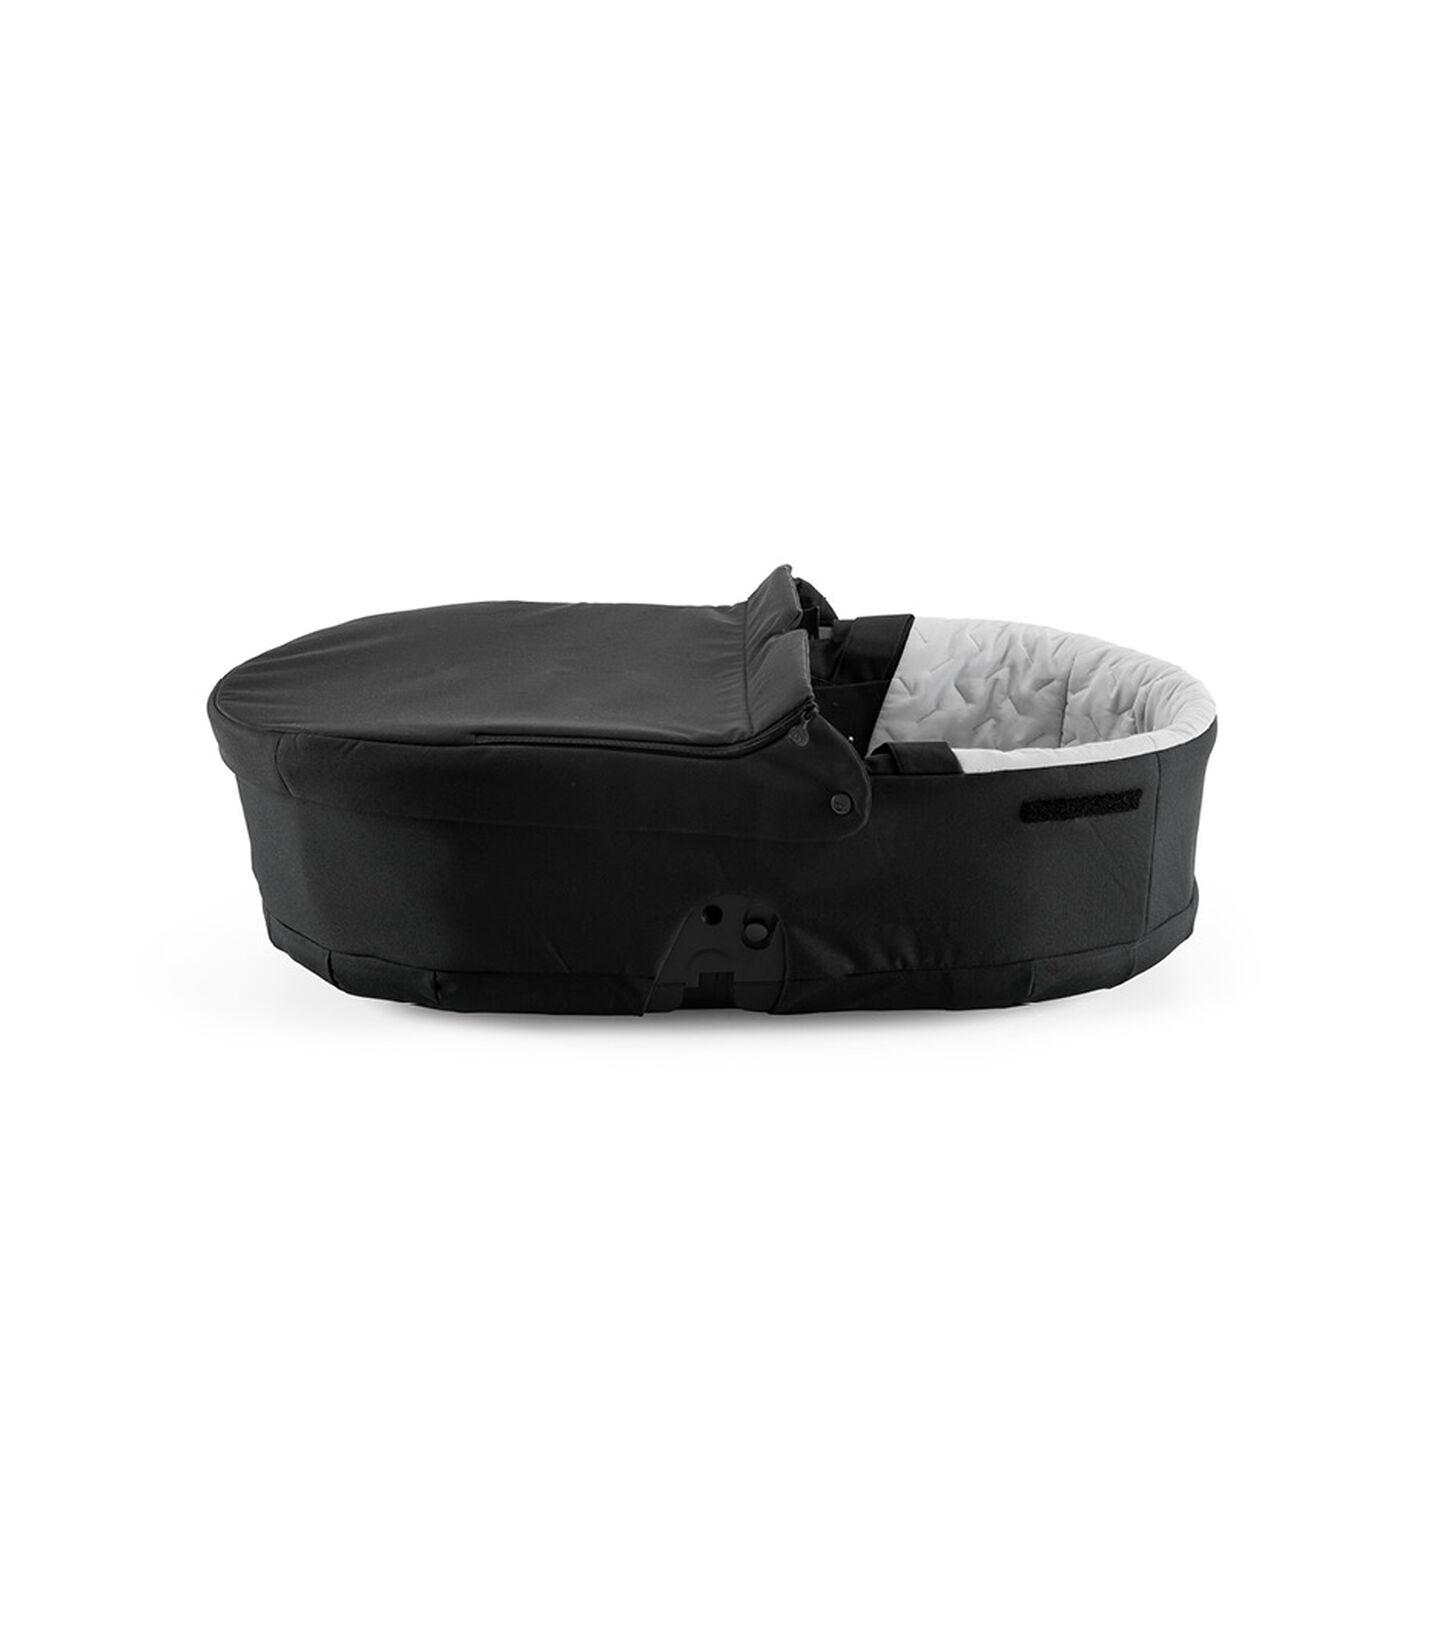 Stokke® Beat Carry Cot Black, Noir, mainview